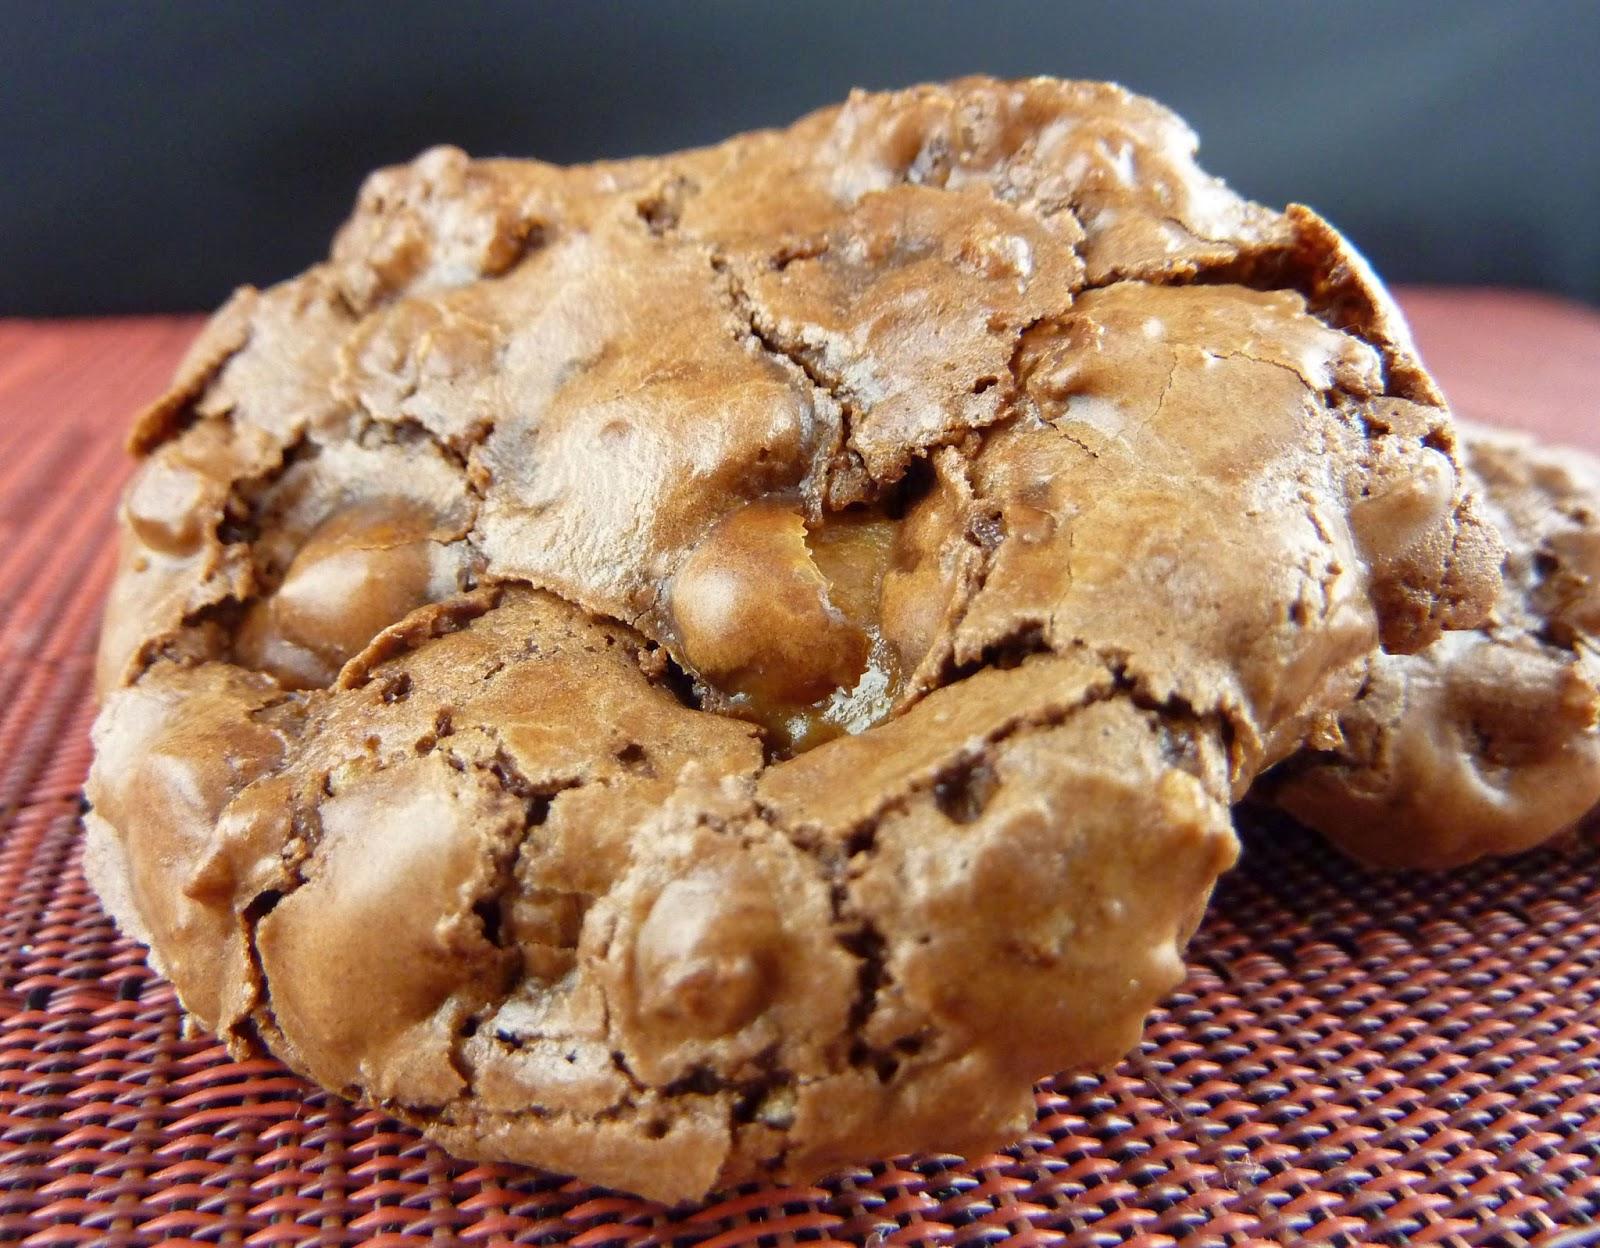 Cookies on Friday: Chocolate Turtle Cookies